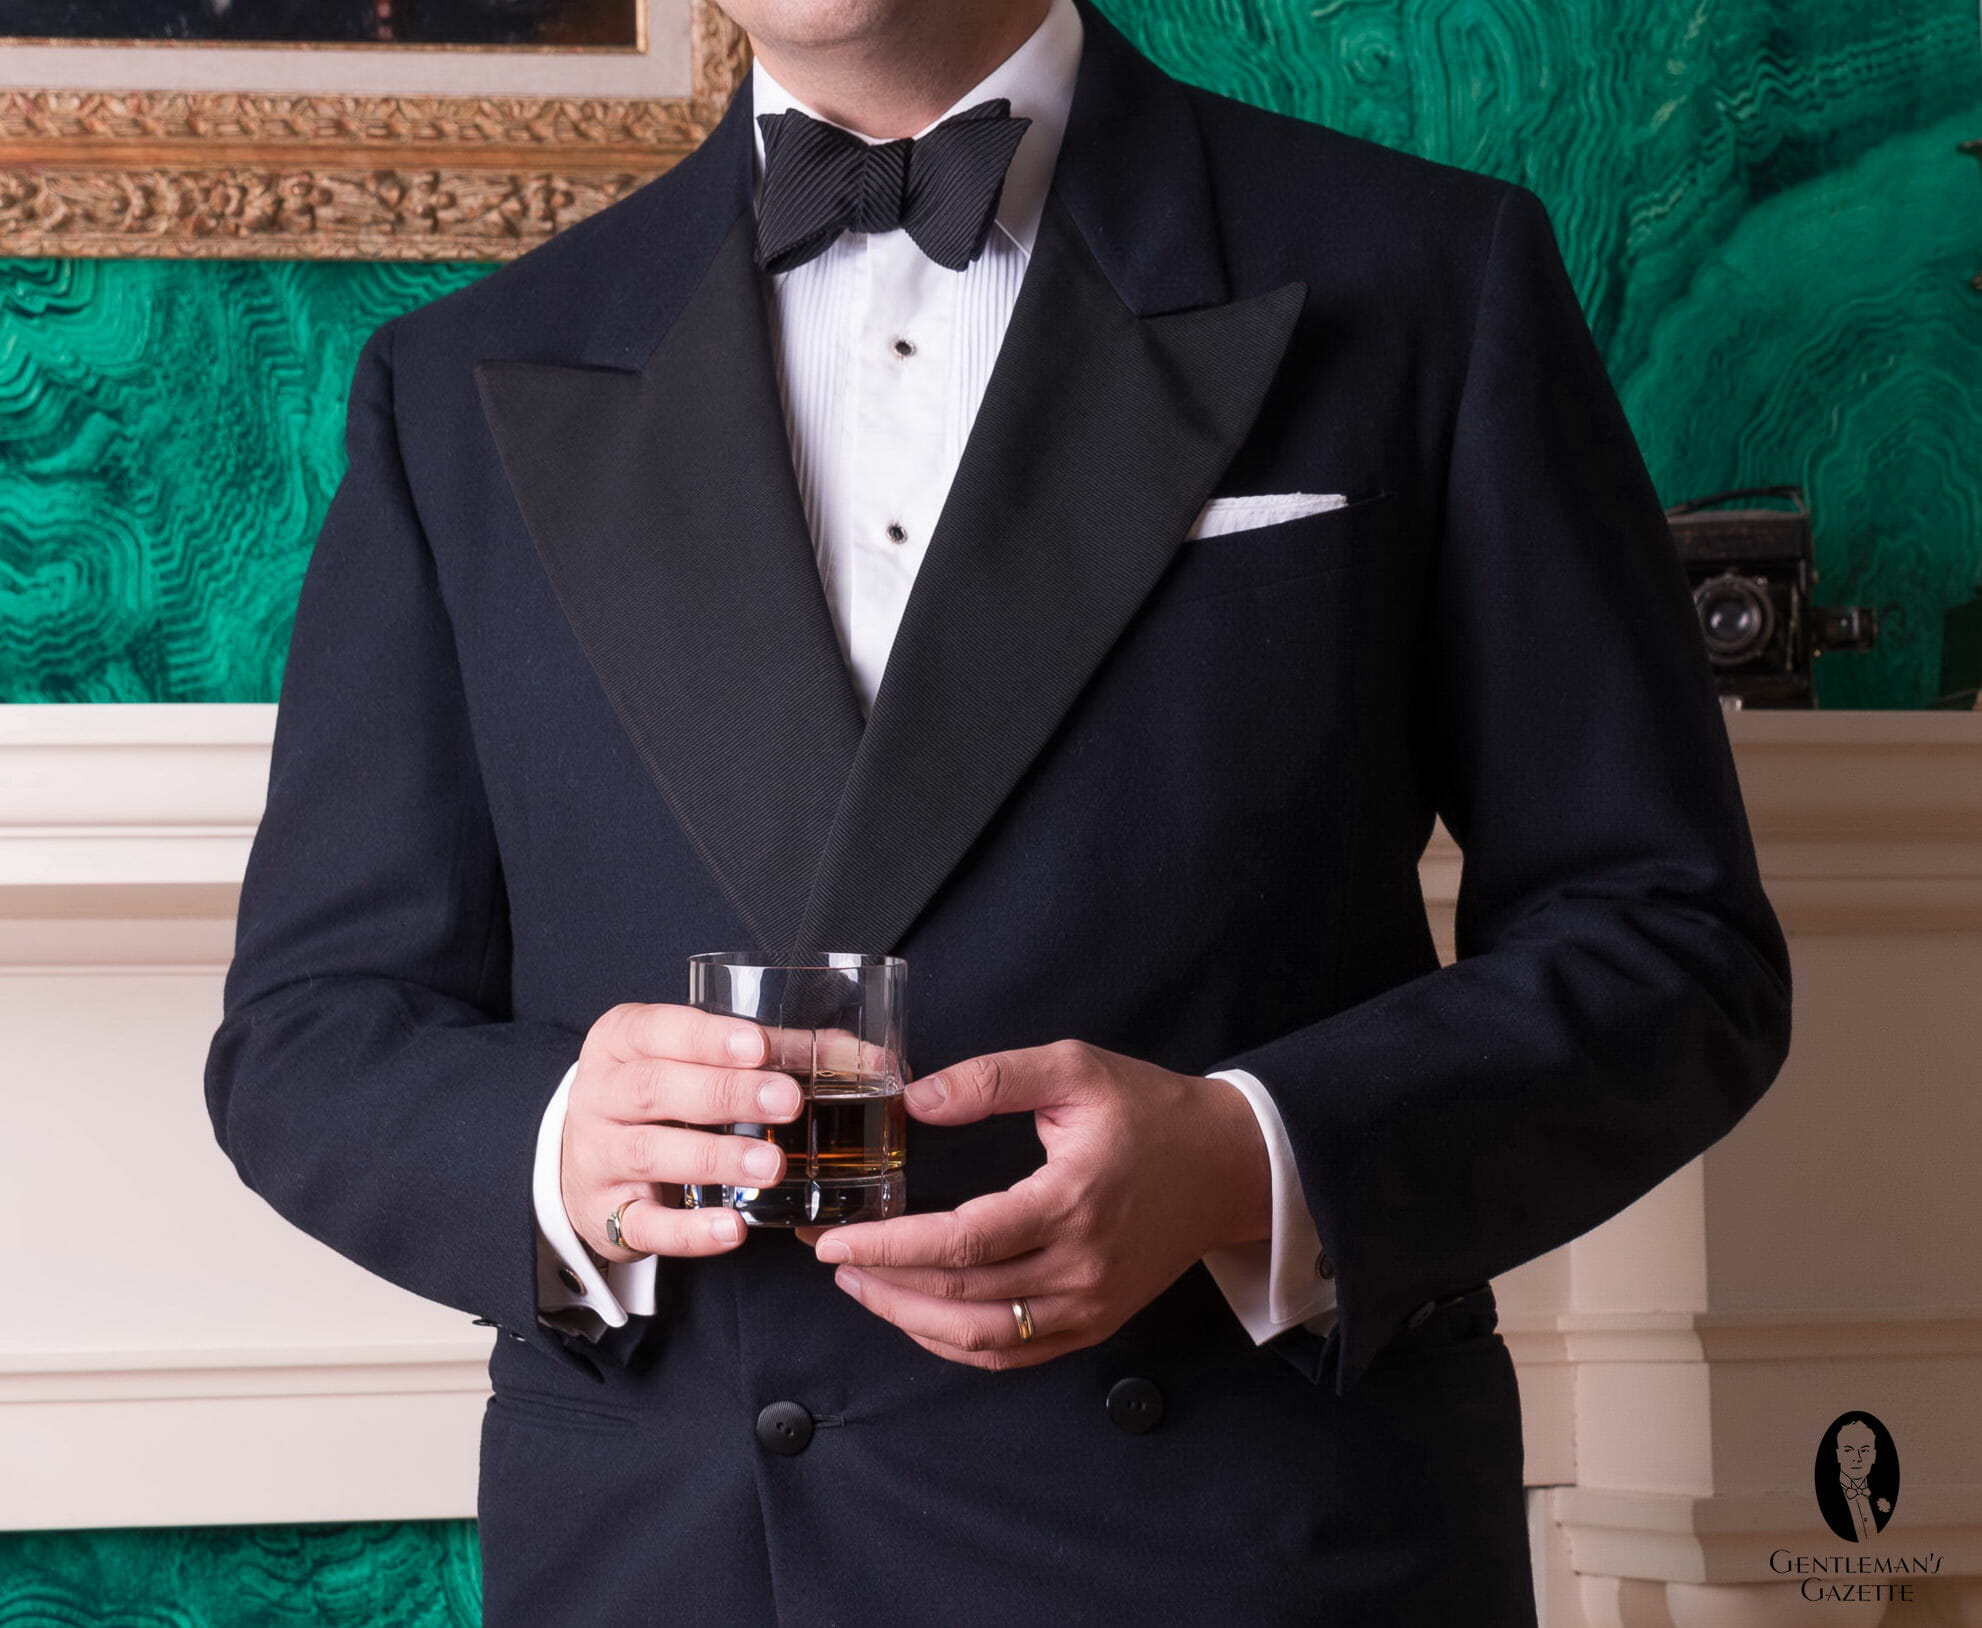 Suit Accessories Art Deco Cufflinks Vintage Cufflinks Vintage Accessories Silver Cufflinks Mens Accessories Cufflinks Gifts for Him